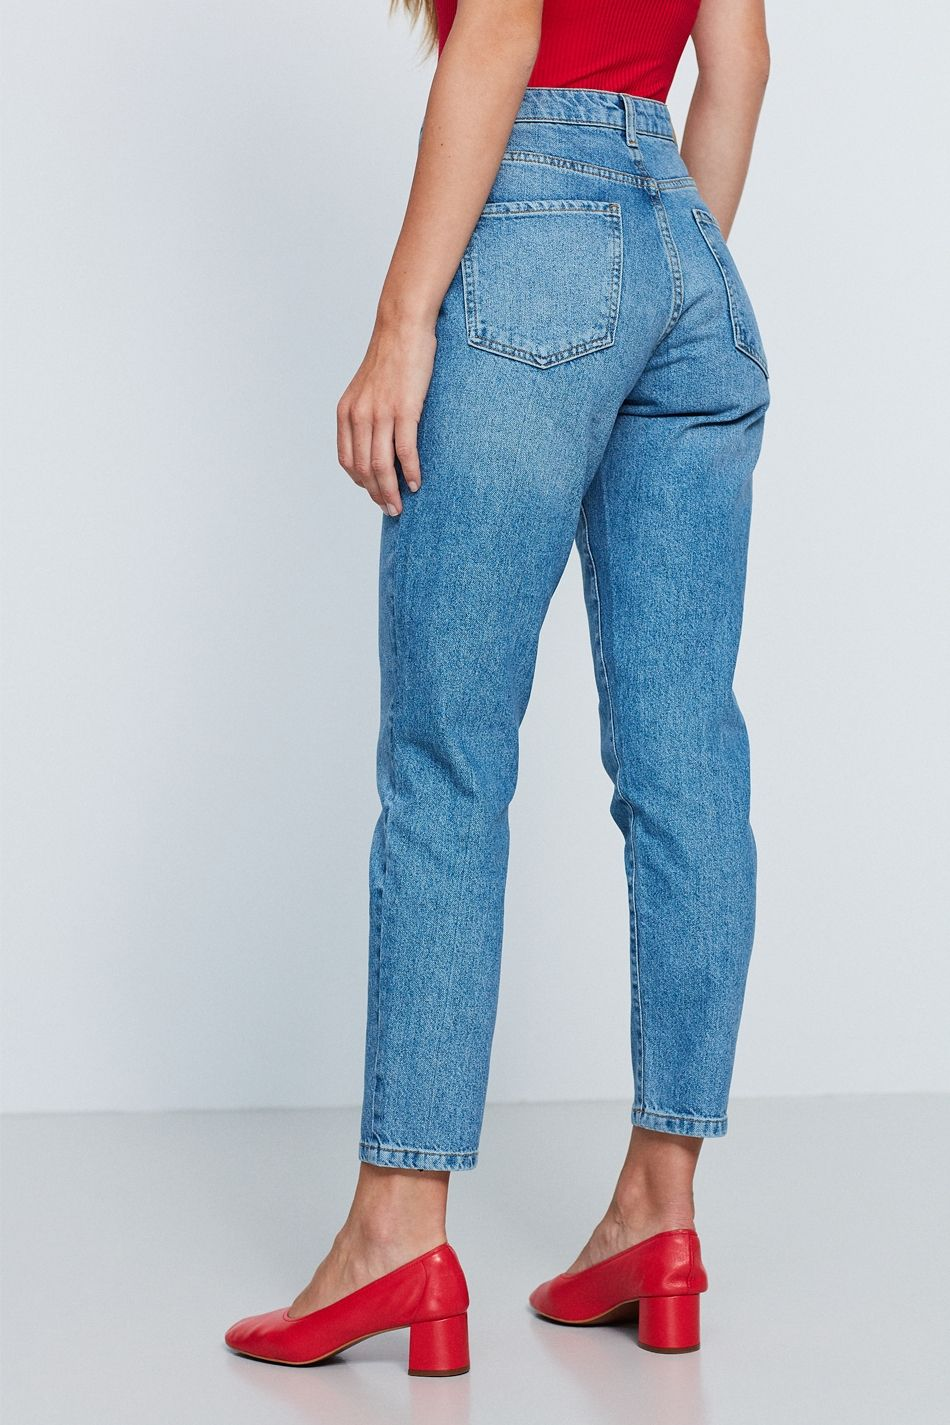 boyfriend jeans gina tricot